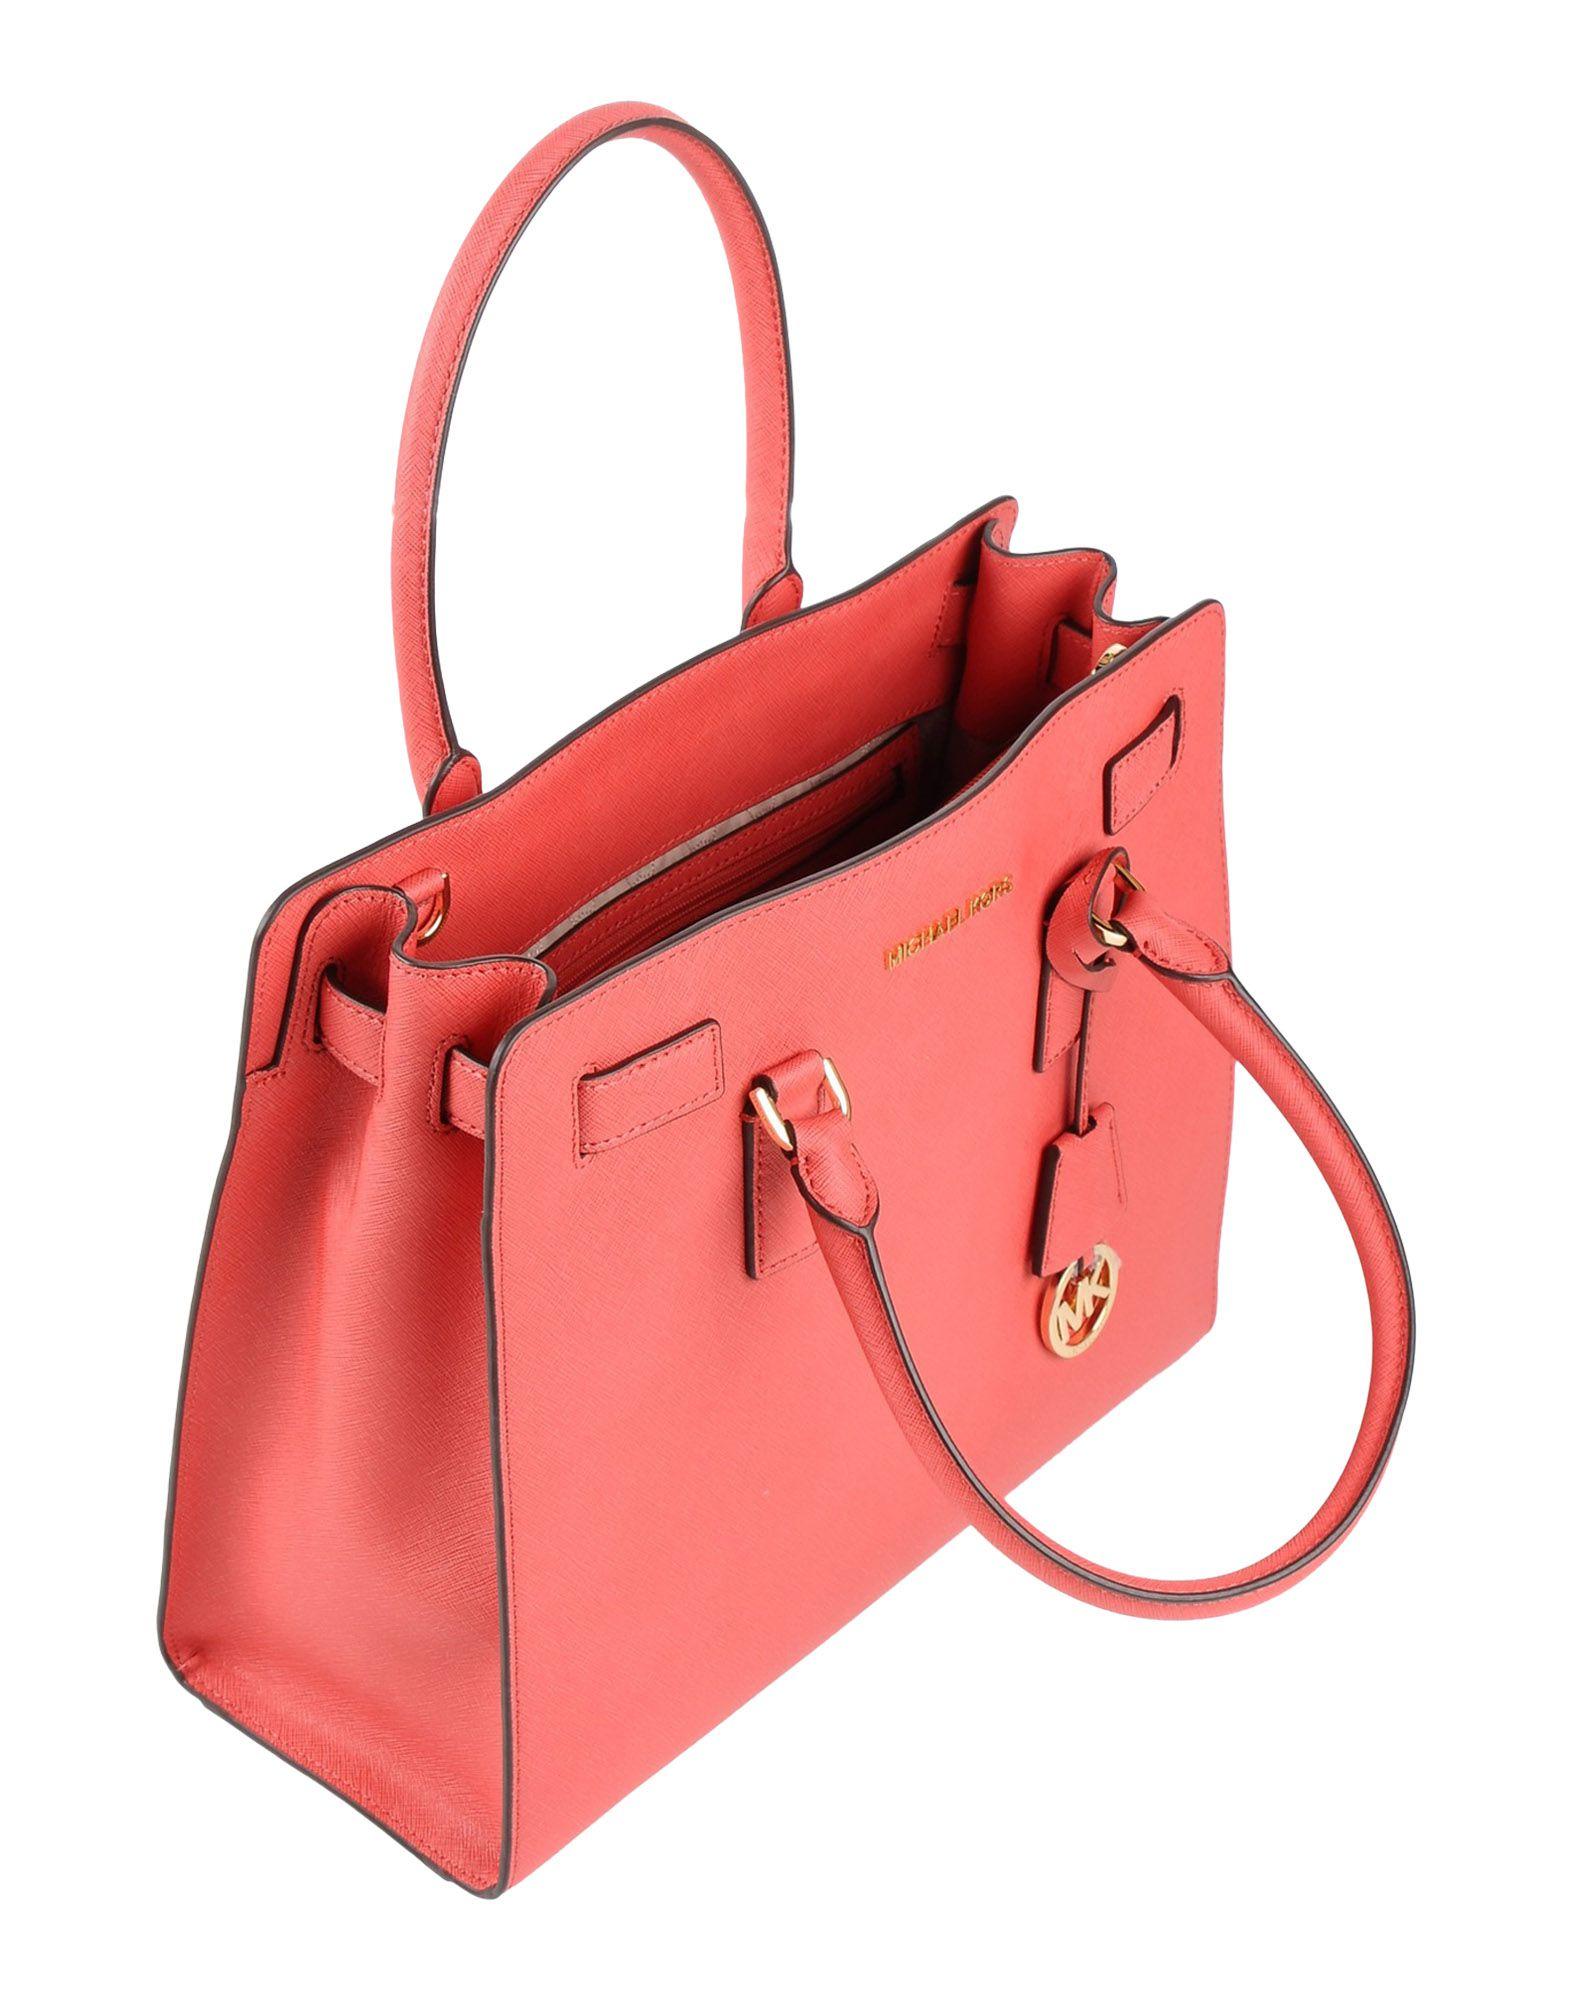 f96427a652 Lyst - MICHAEL Michael Kors Handbag in Pink